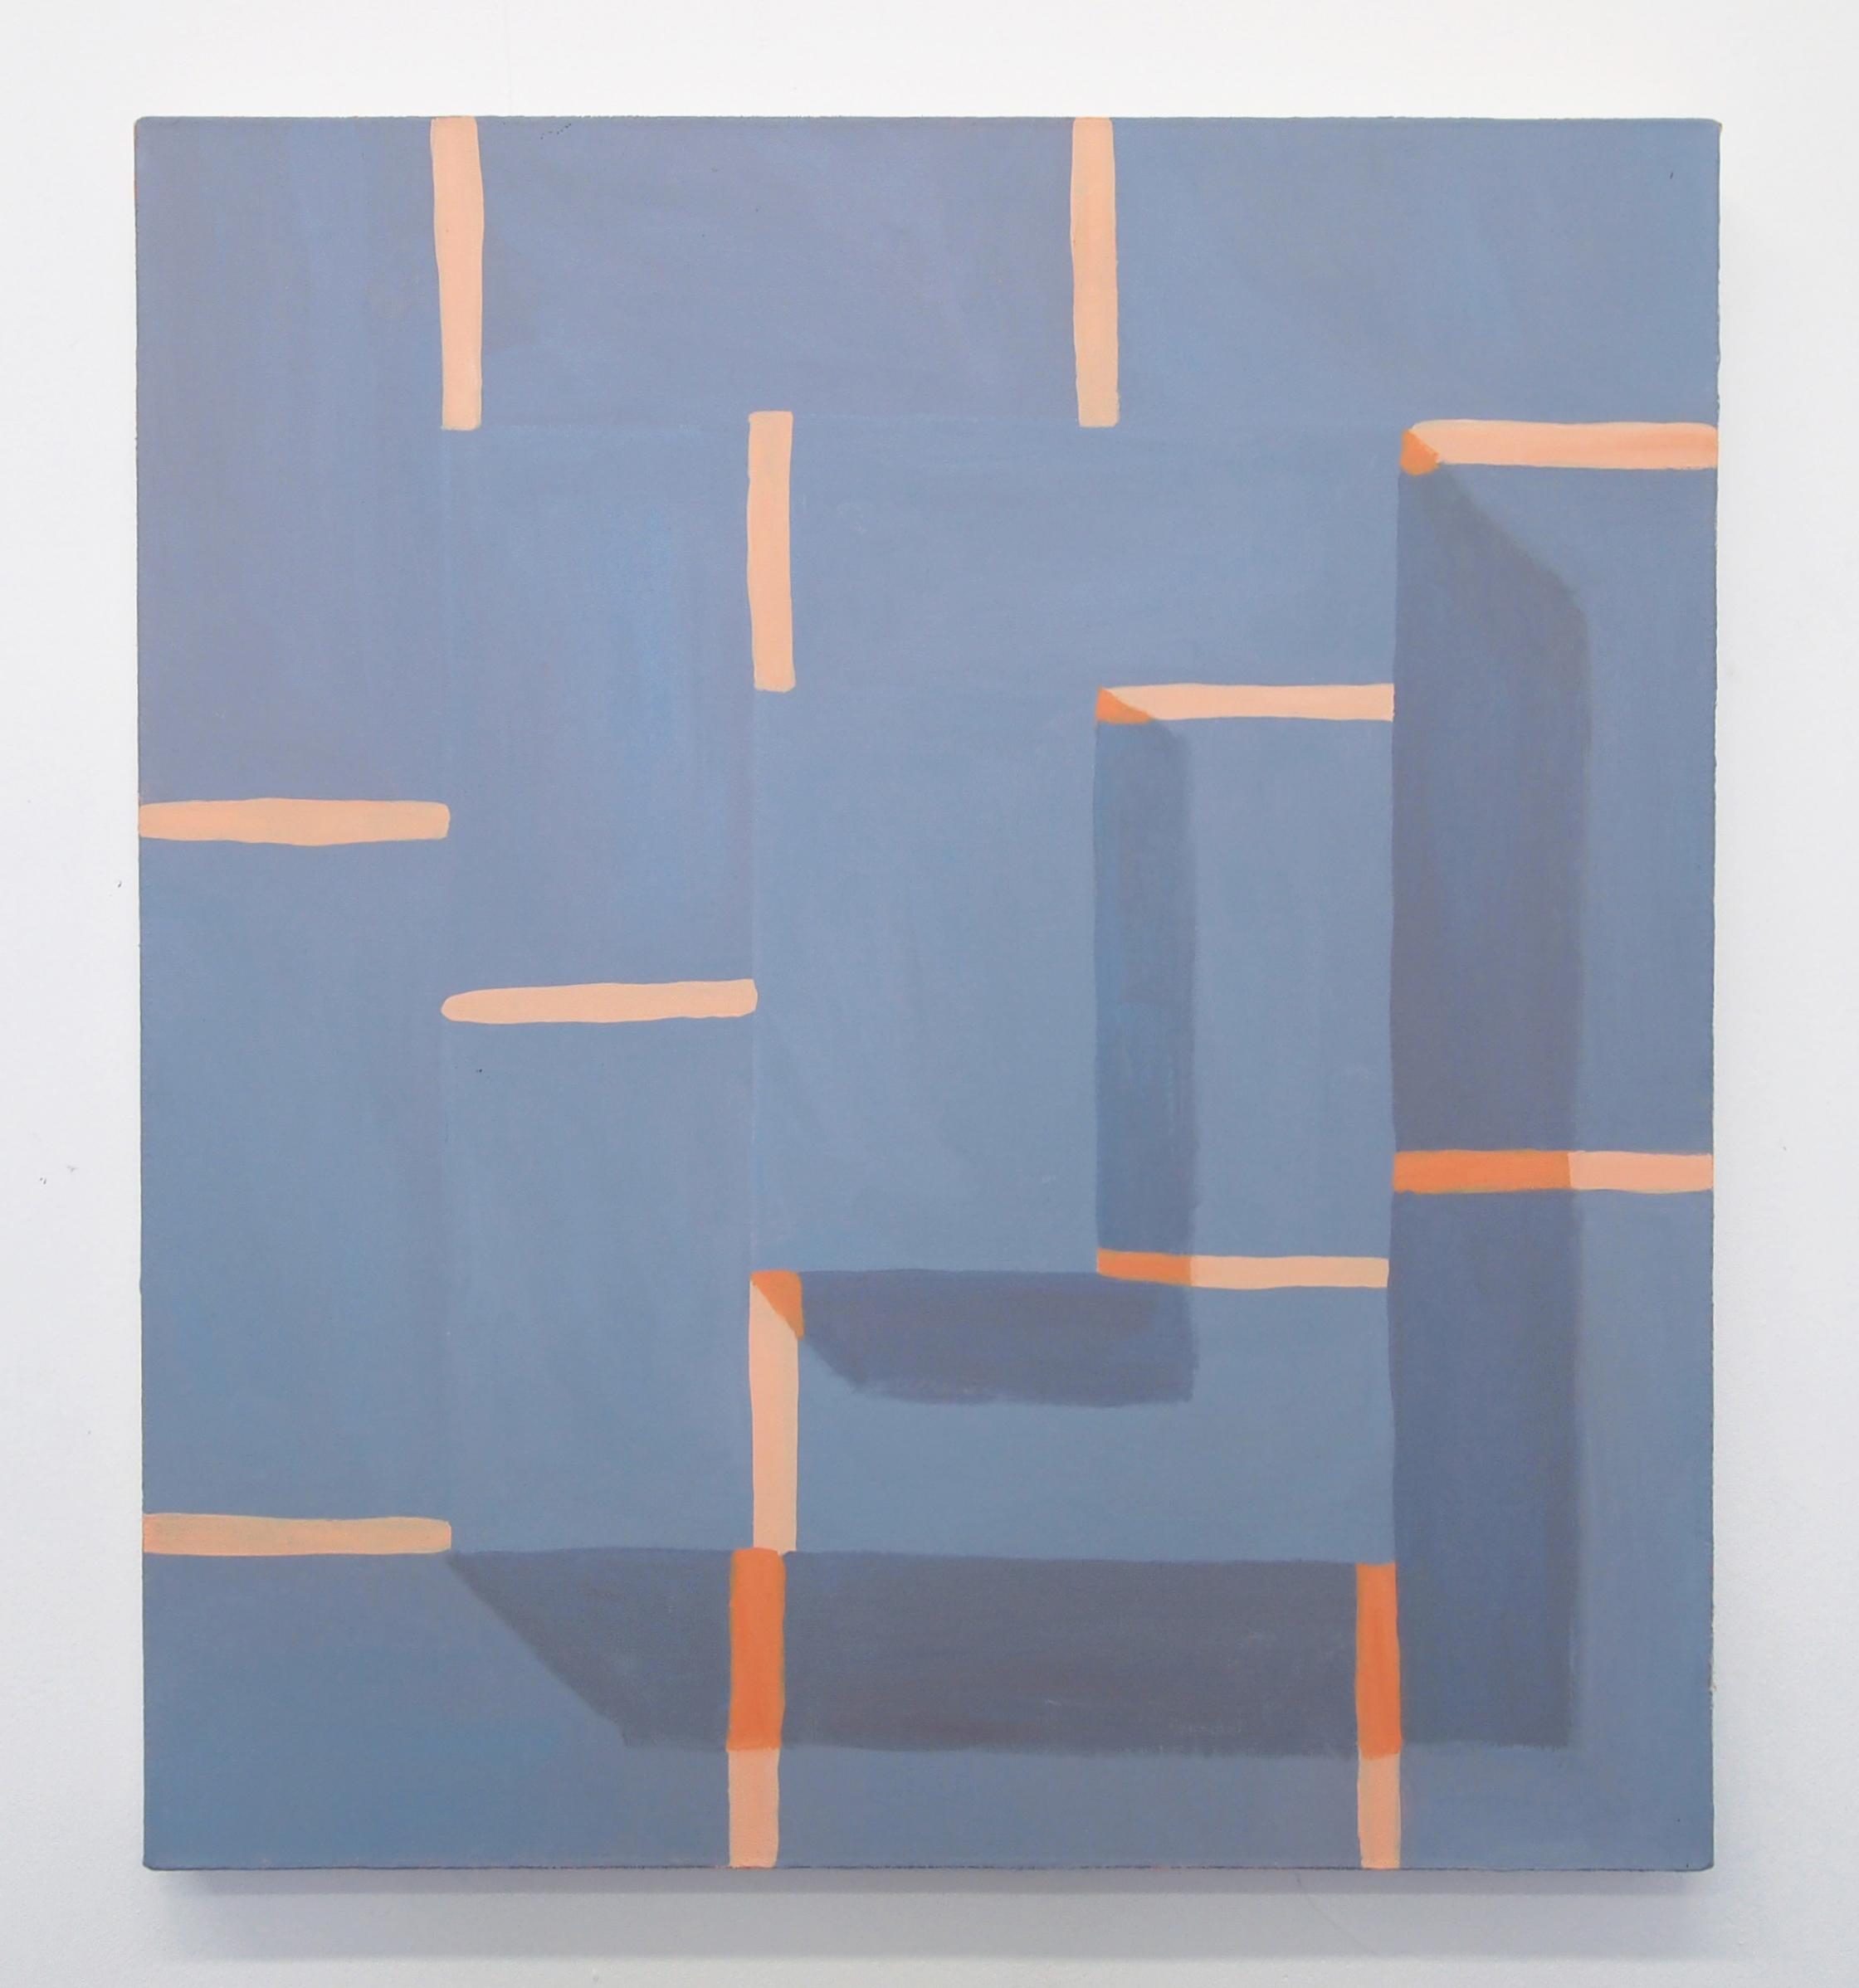 Corydon Cowansage, Stack #9, 2017, 20 x 18 inches, acrylic on canvas